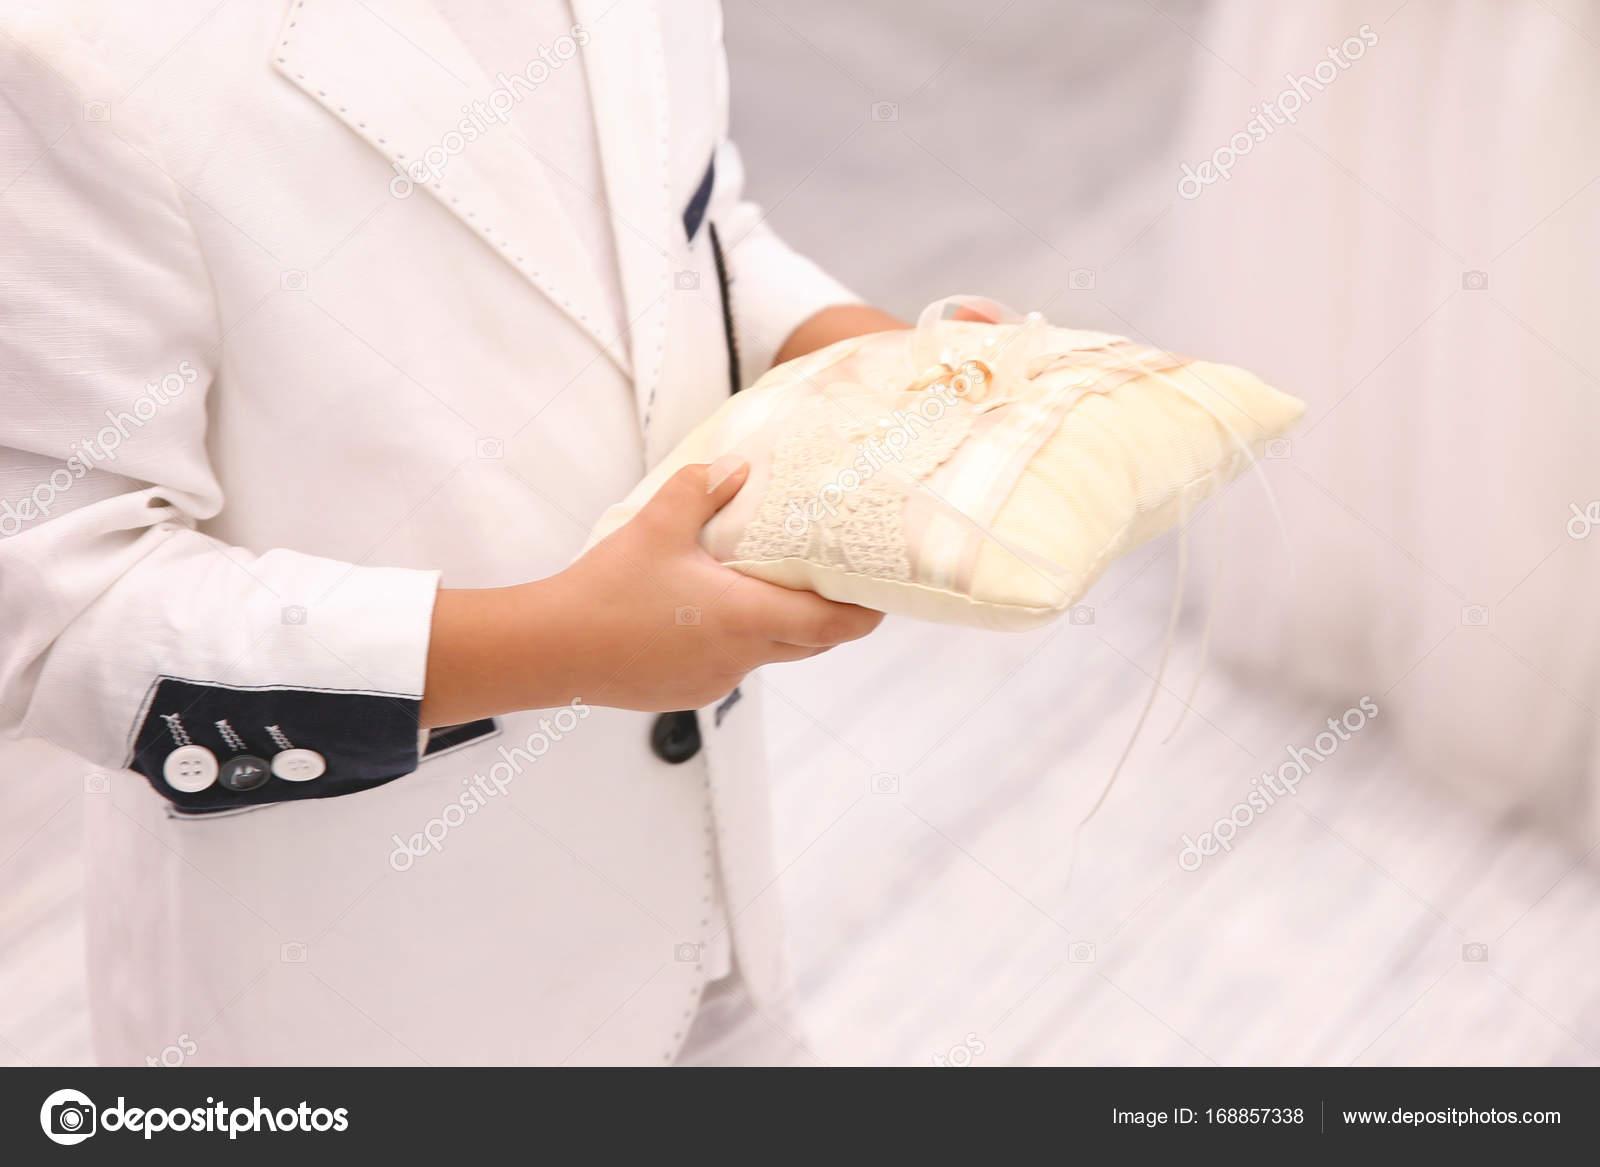 Little Boy Holding Wedding Rings On Pillow Indoors Stock Photo: Wedding Band Little Boy At Reisefeber.org